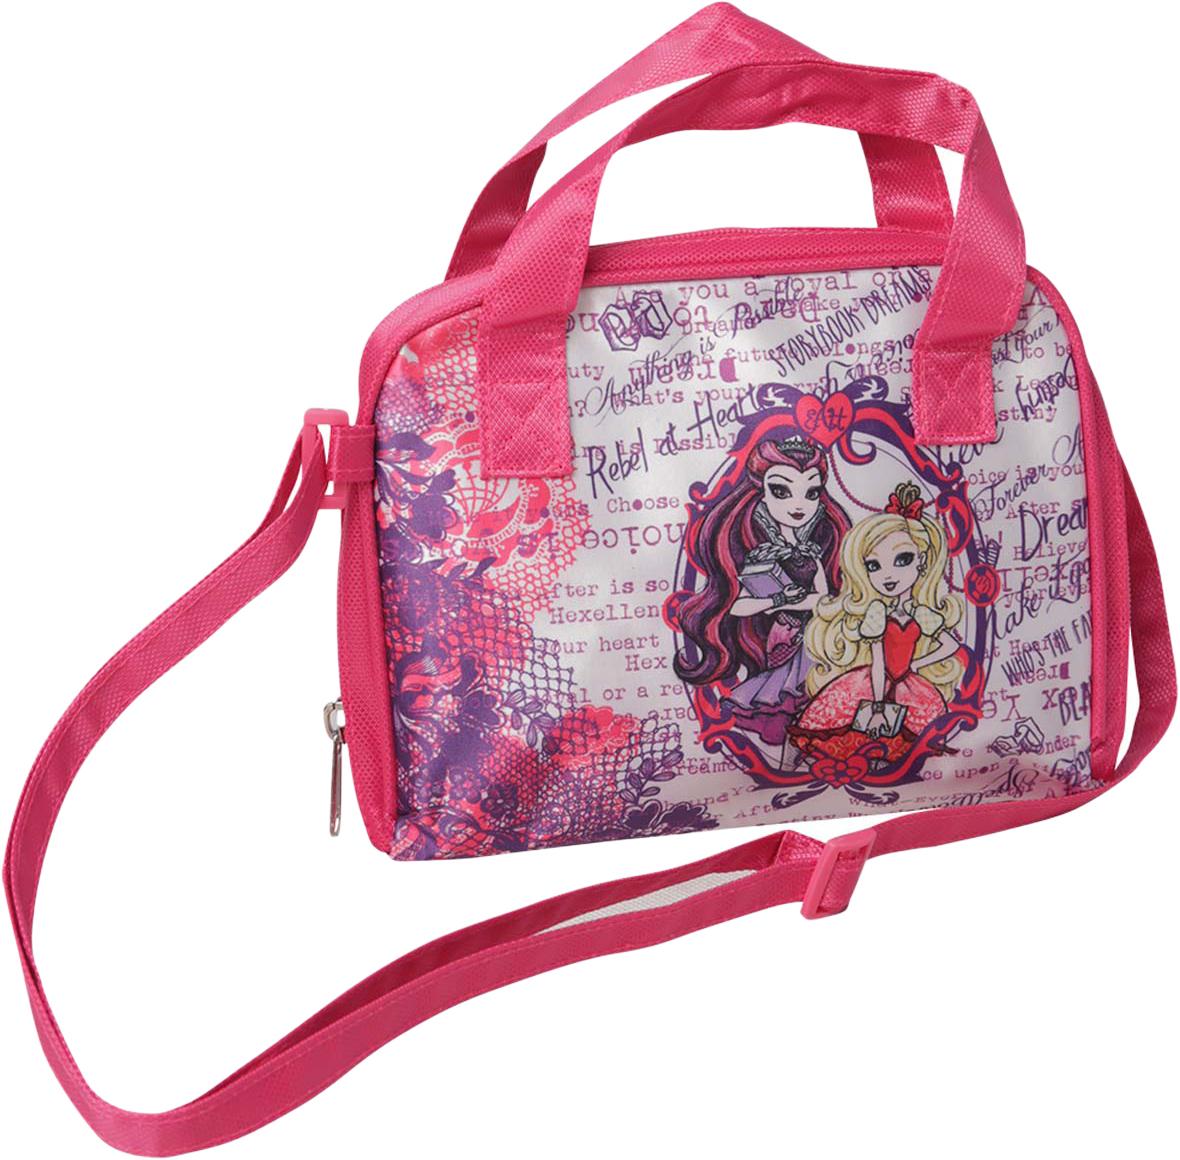 Mattel Сумка детская Ever After High цвет розовый limpopo детская доска для рисования маркером ever after high mattel